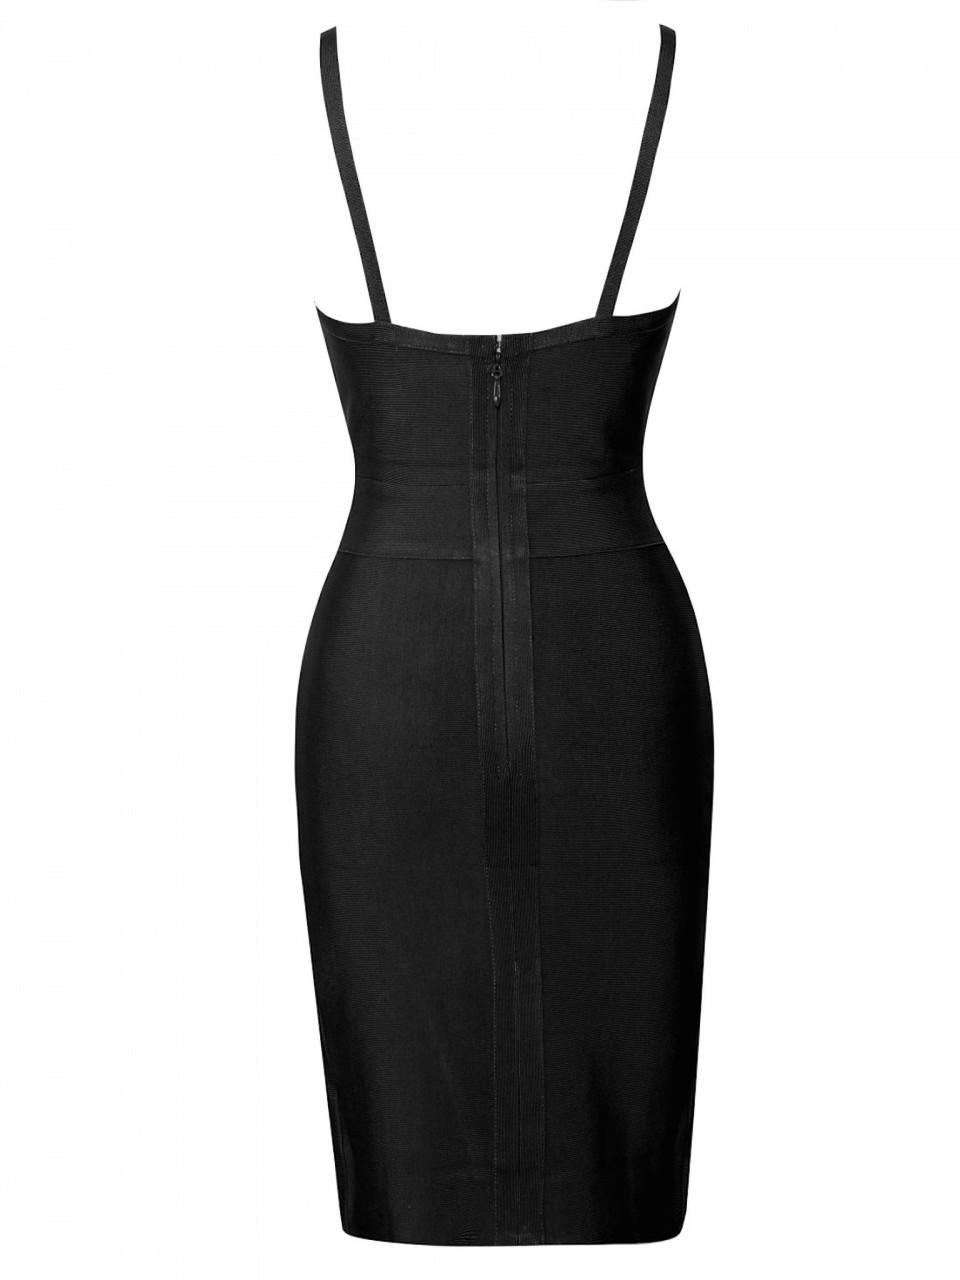 Black High Slit Strappy Celeb Inspired Bandage Dress